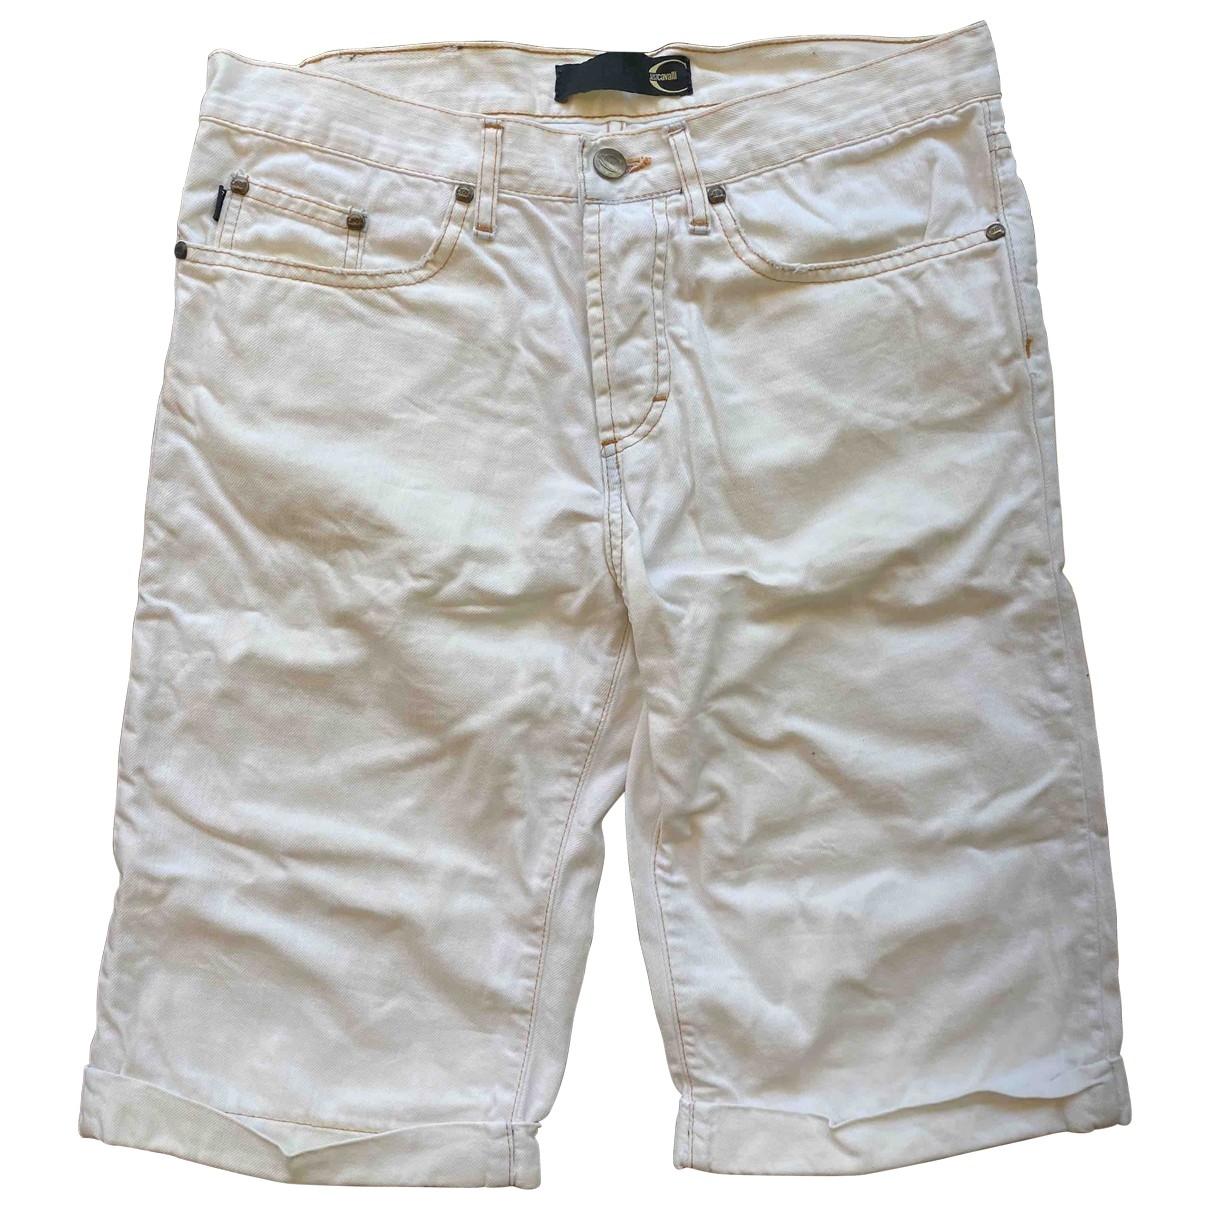 Just Cavalli \N Shorts in  Weiss Denim - Jeans